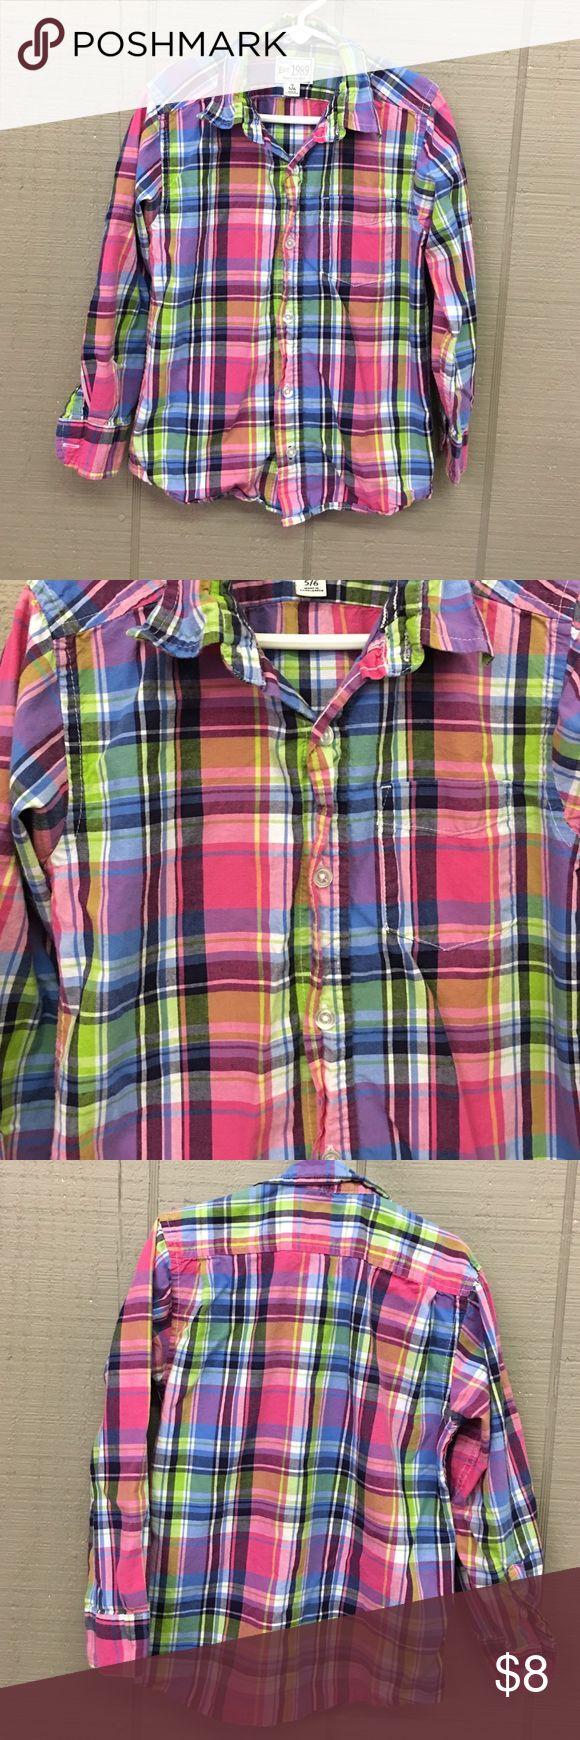 Children's Place pink blue & green plaid shirt 5/6 Children's Place pink blue & green plaid shirt button down shirt, great shirt for Easter 🐇🥚 Children's Place Shirts & Tops Button Down Shirts